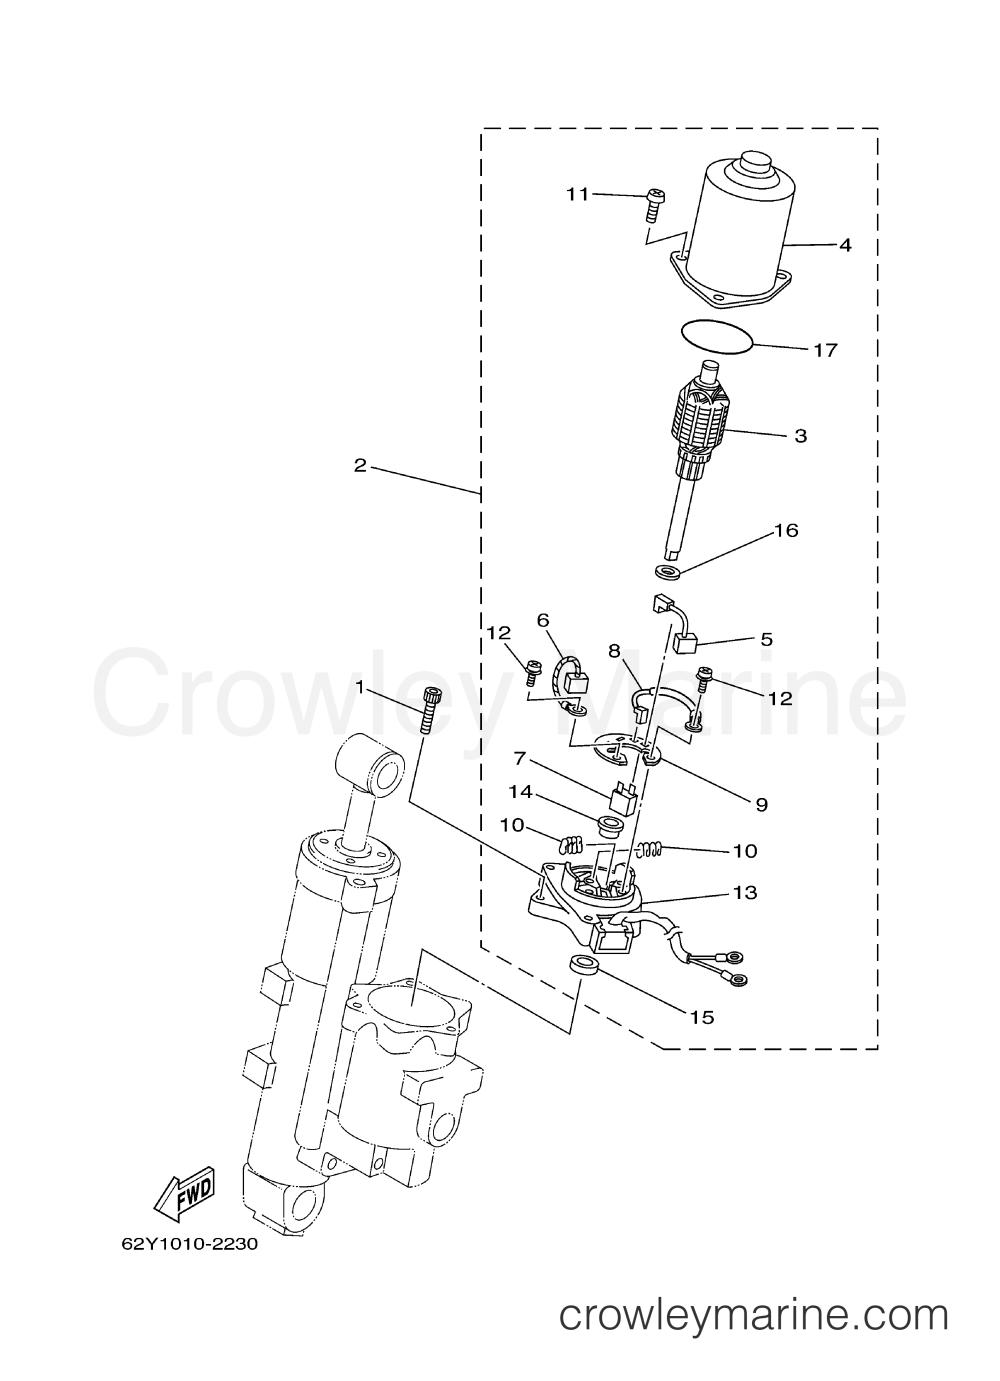 medium resolution of power tilt and trim 50 hp auto electrical wiring diagram amplifier taa861 powersupplycircuit circuit diagram seekiccom